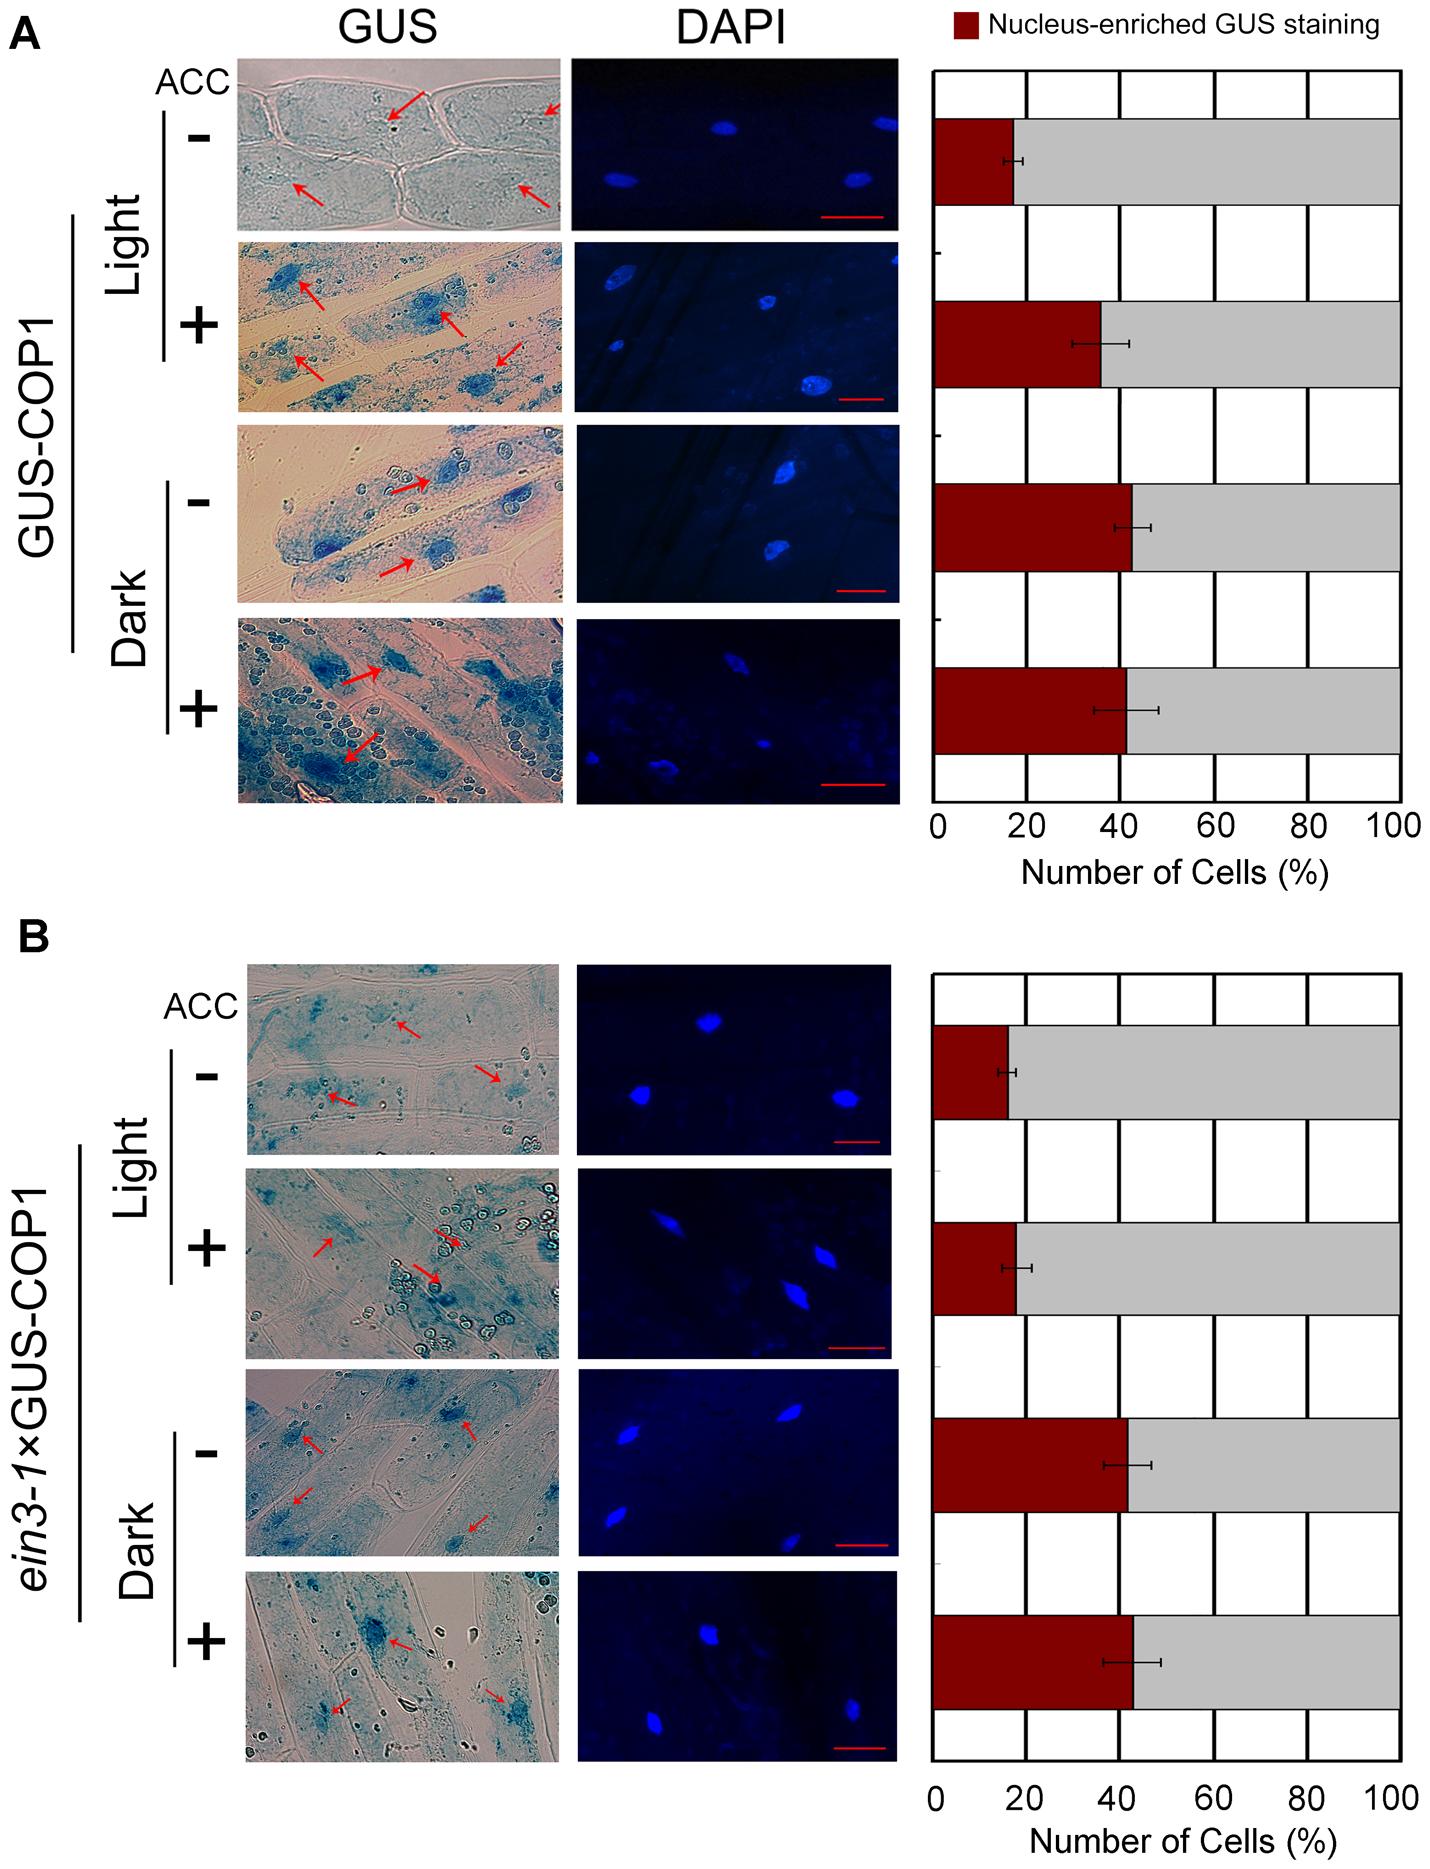 The ethylene precursor ACC improves COP1 nucleus-enriched localisation in the light.